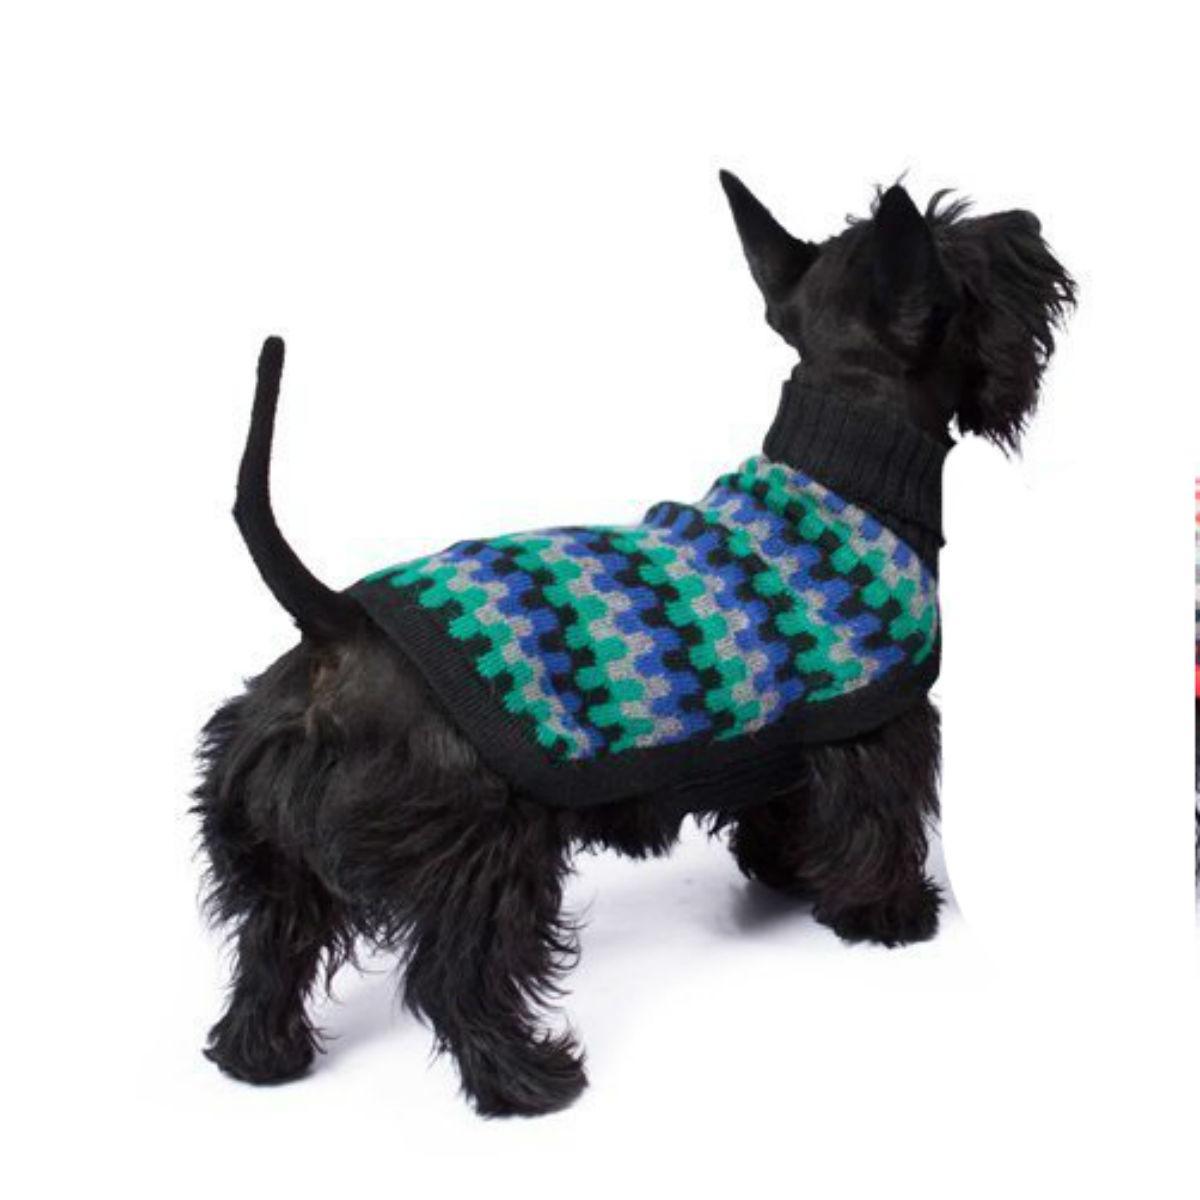 Night Waves Alpaca Dog Sweater by Alqo Wasi